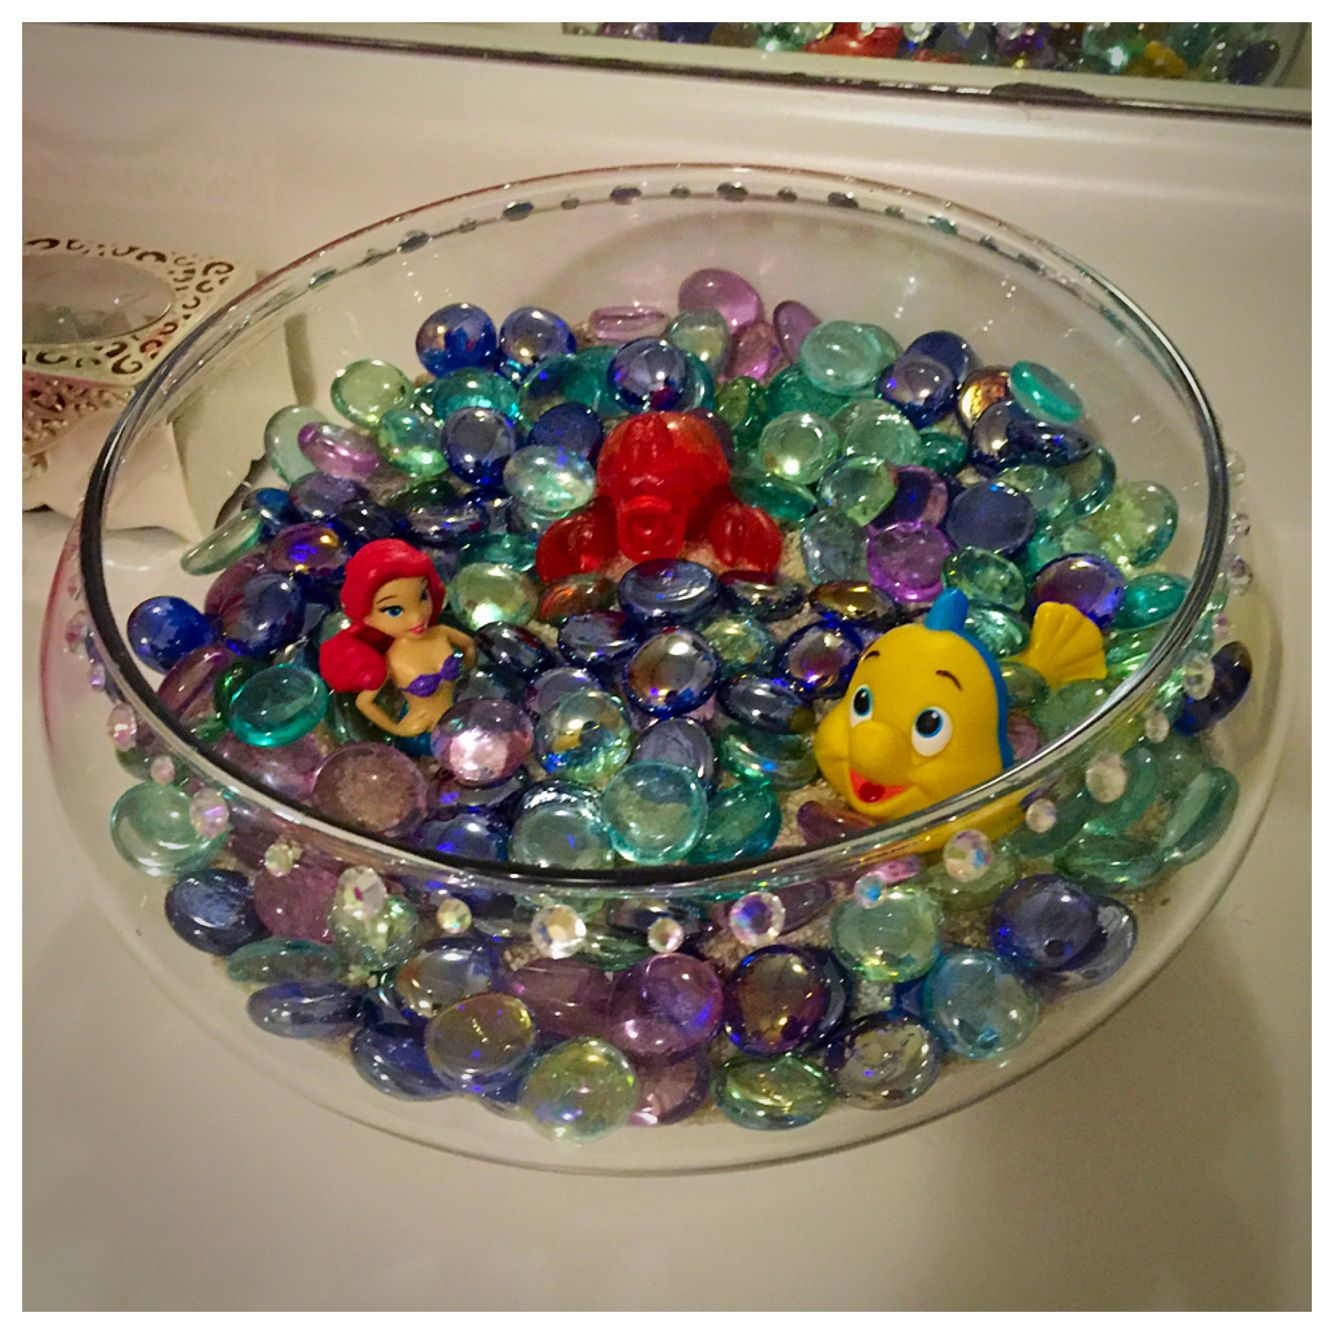 Little Mermaid Bathroom Decor